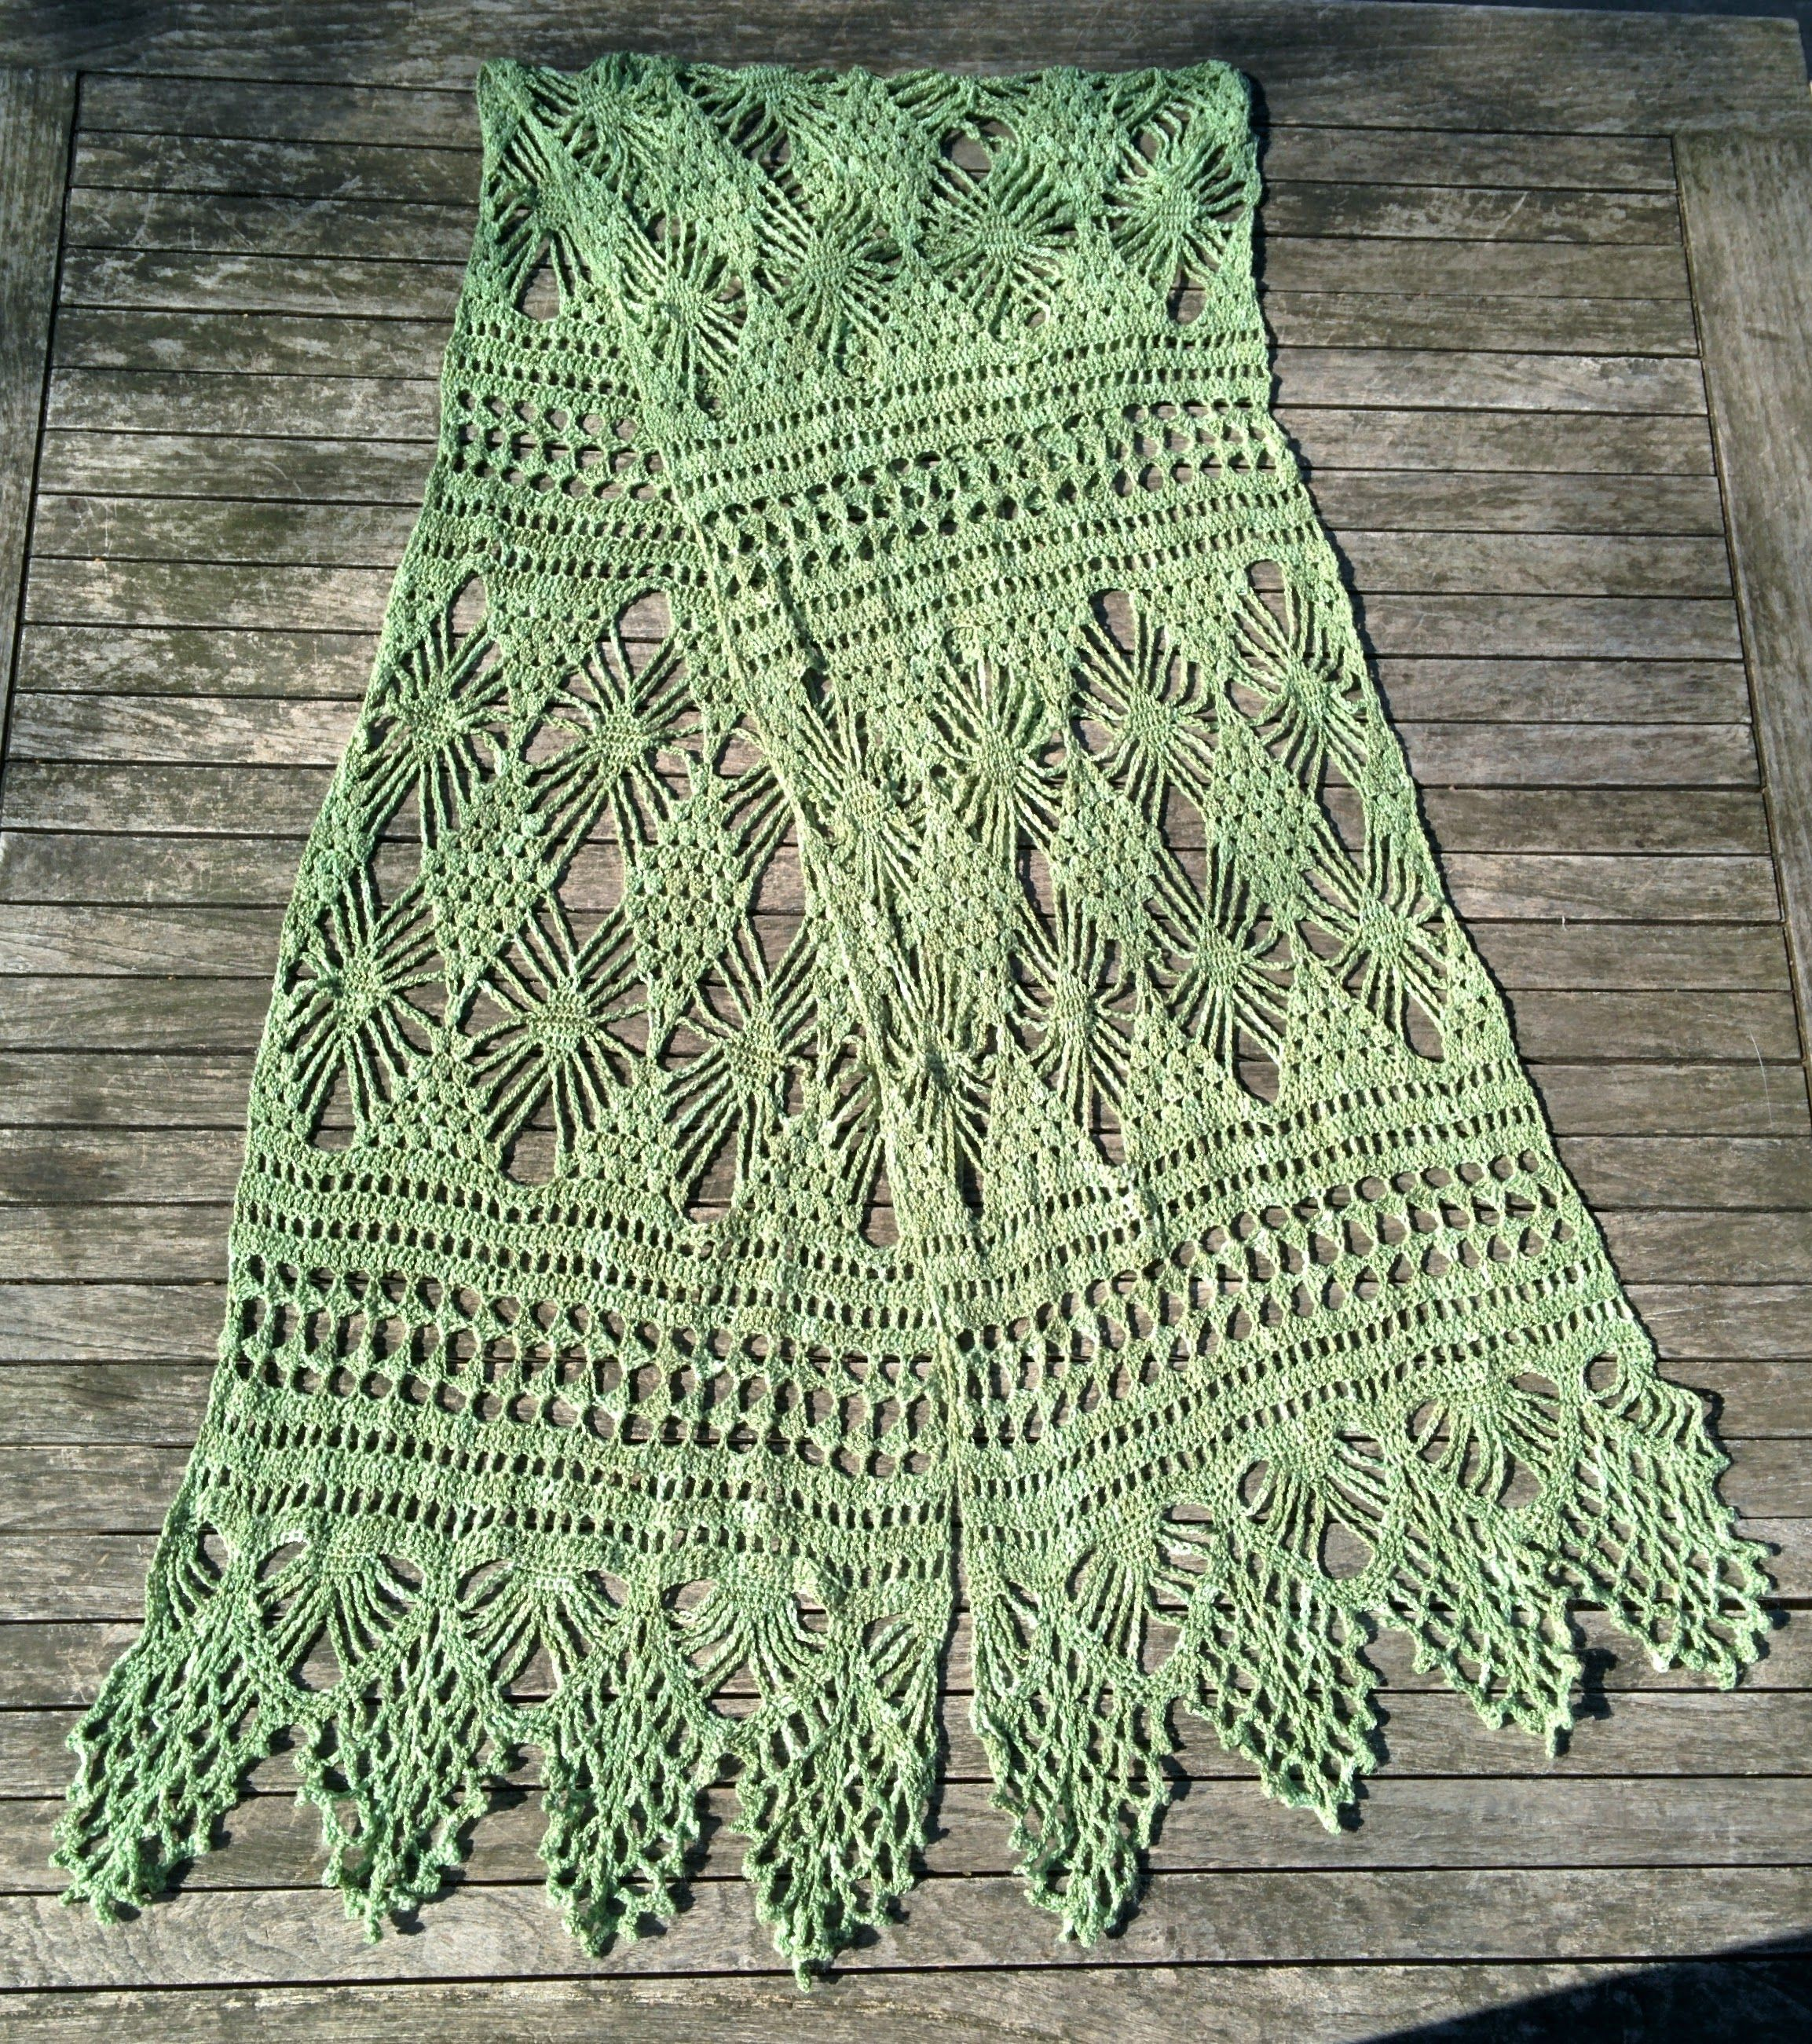 Single Skein Crochet Shawl The Process Of Reading Crochet Charts